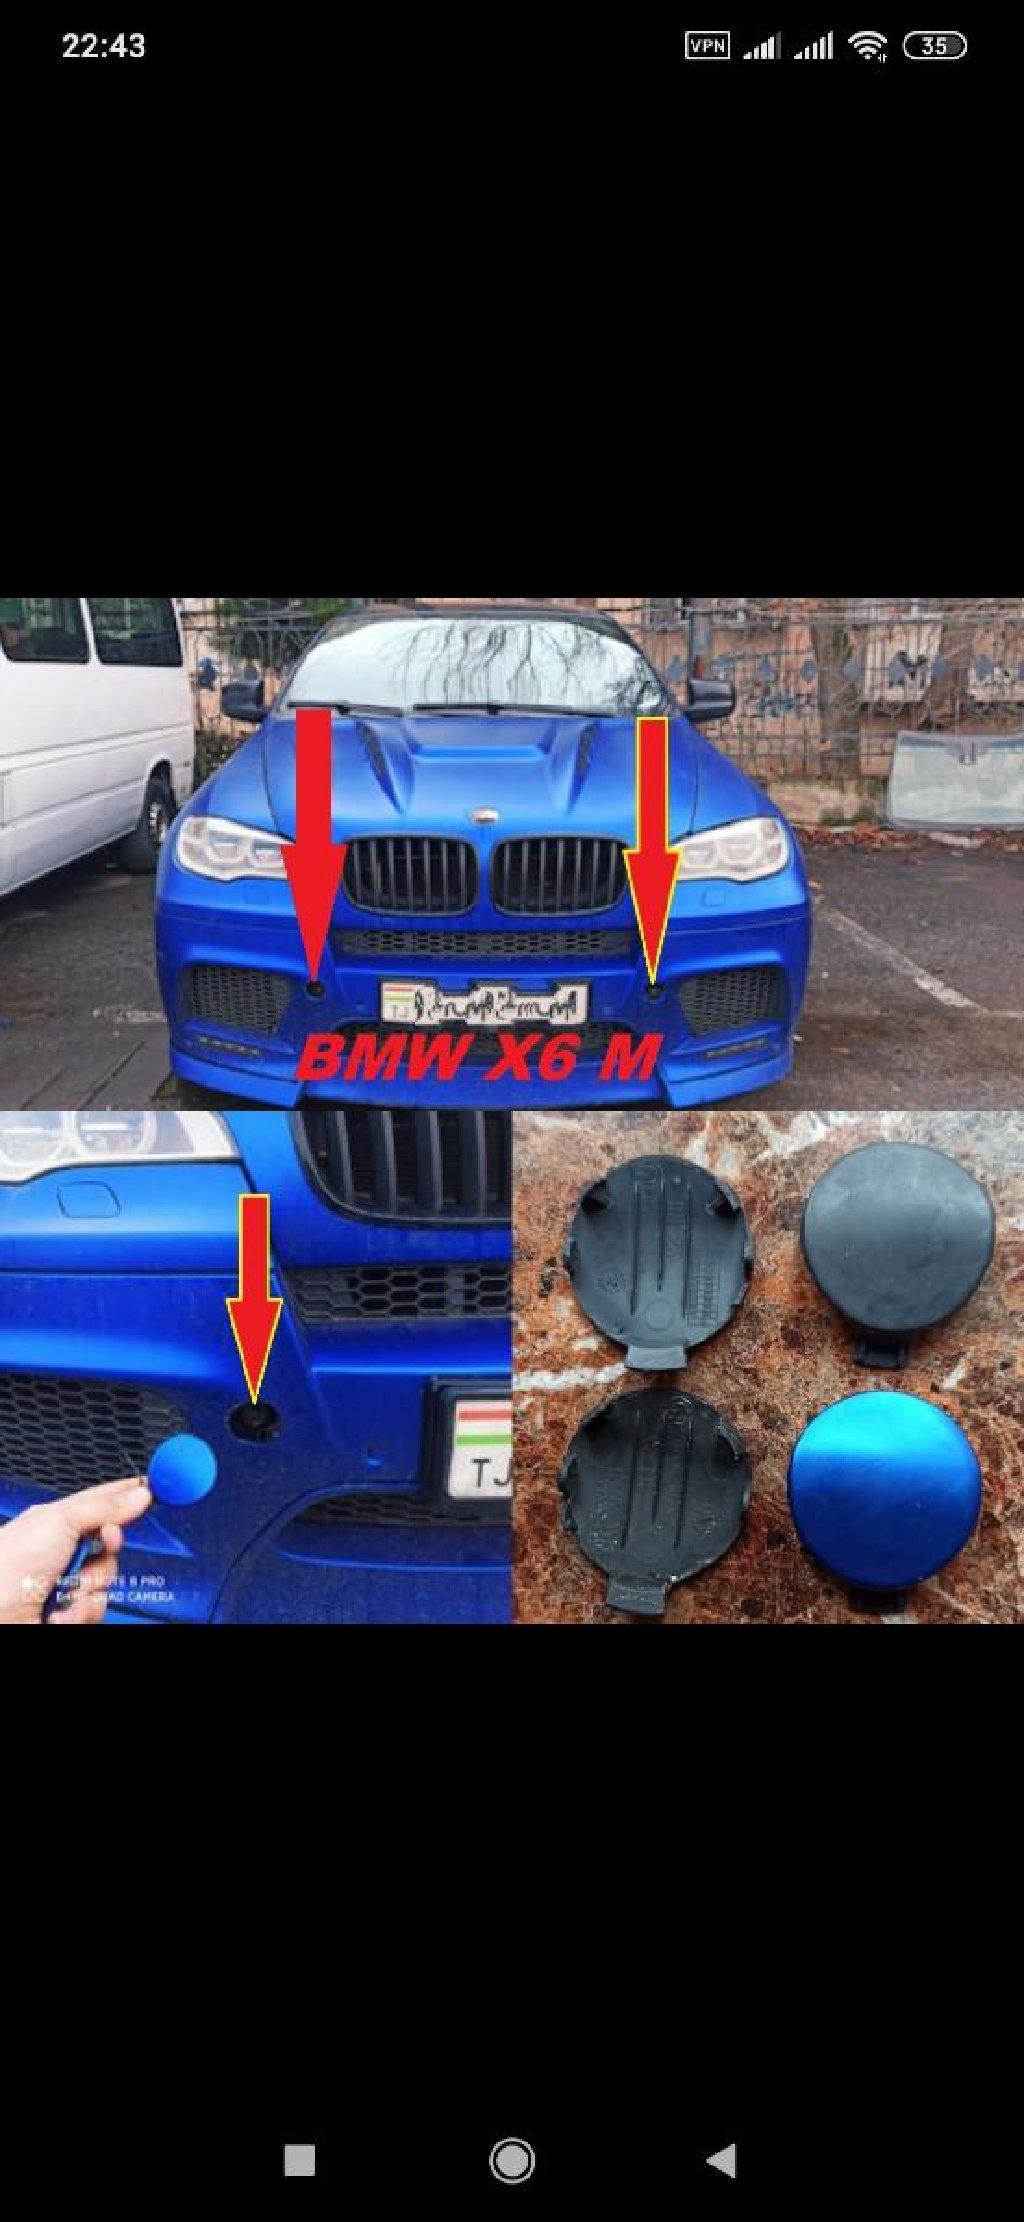 Буксировочная заглушка от BMW X6 M: Буксировочная заглушка от BMW X6 M